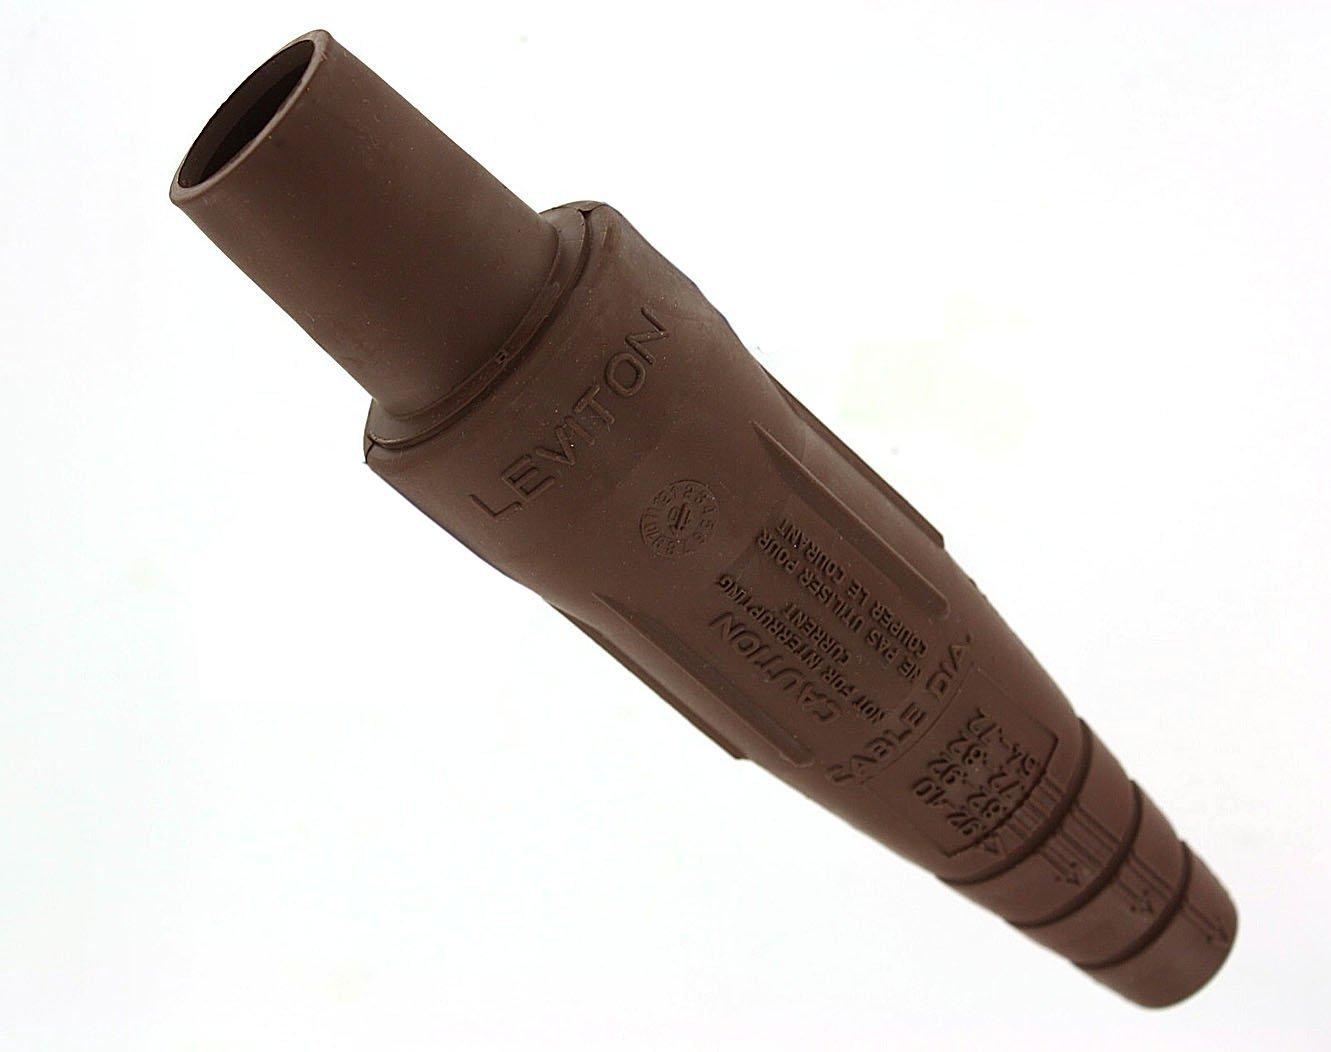 Leviton 16D33-UH 16-Series Taper Nose, Female Plug, Contact, Double Set Screw Termination, Brown